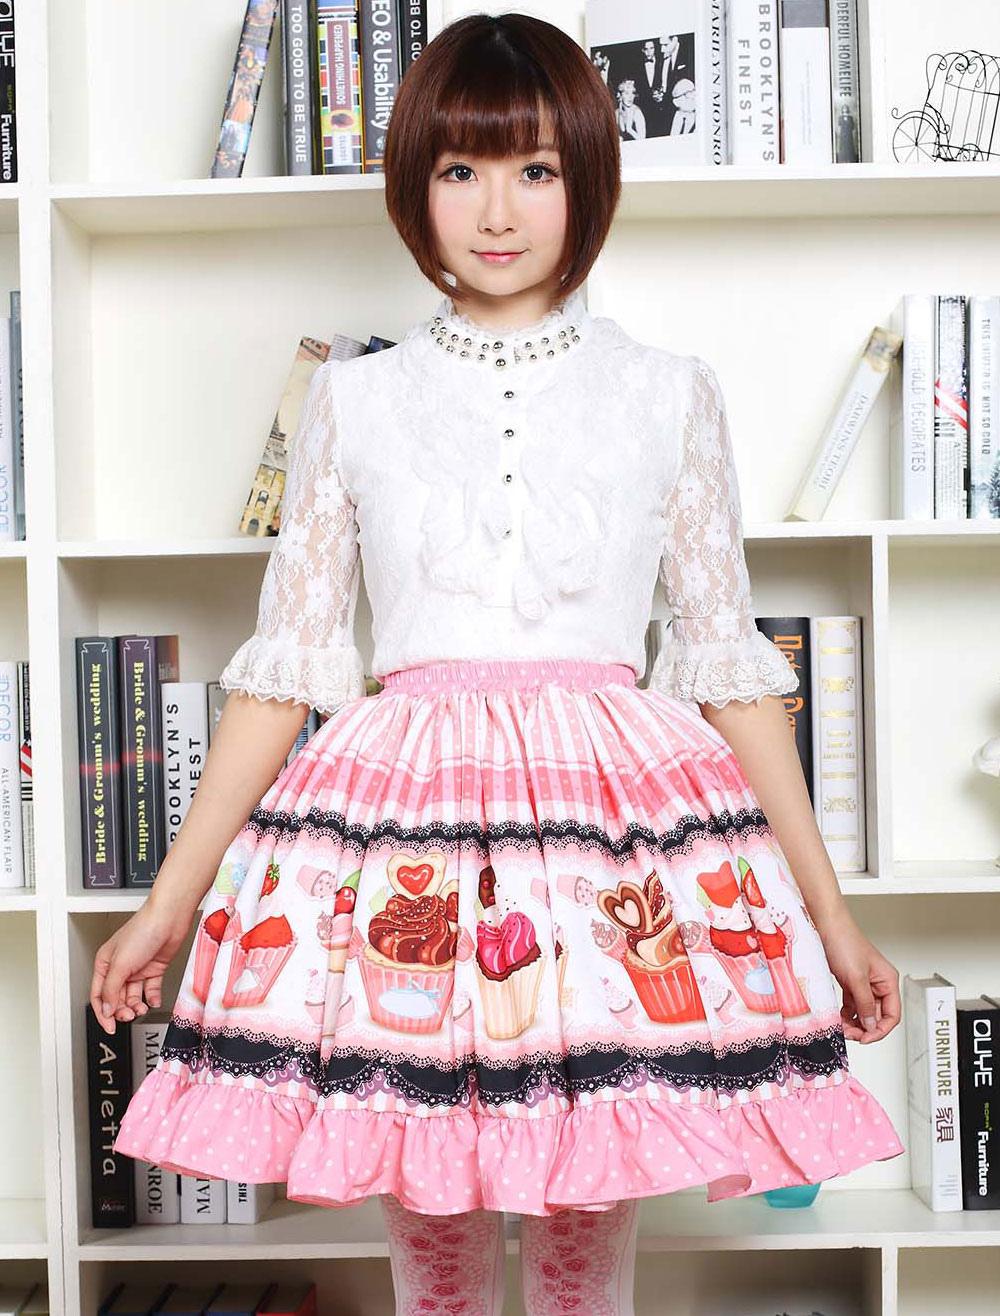 Pink Lolita Dress Sweet Cupcake Printed Lolita Skirt Ruffles Trim